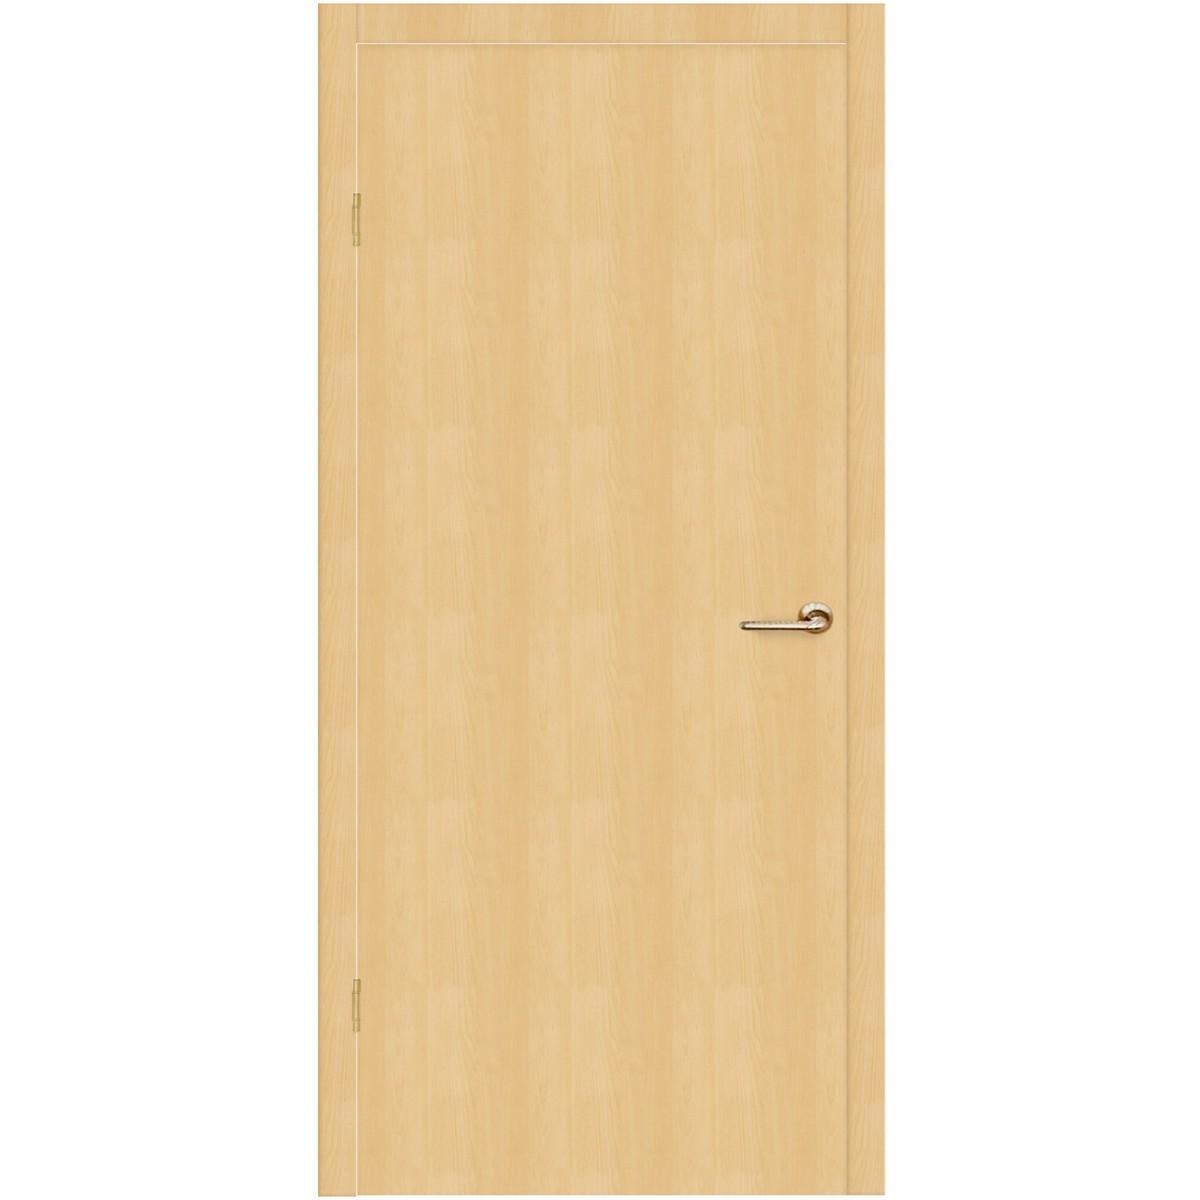 Дверь межкомнатная глухая Belleza 90x200 см ламинация цвет дуб белый